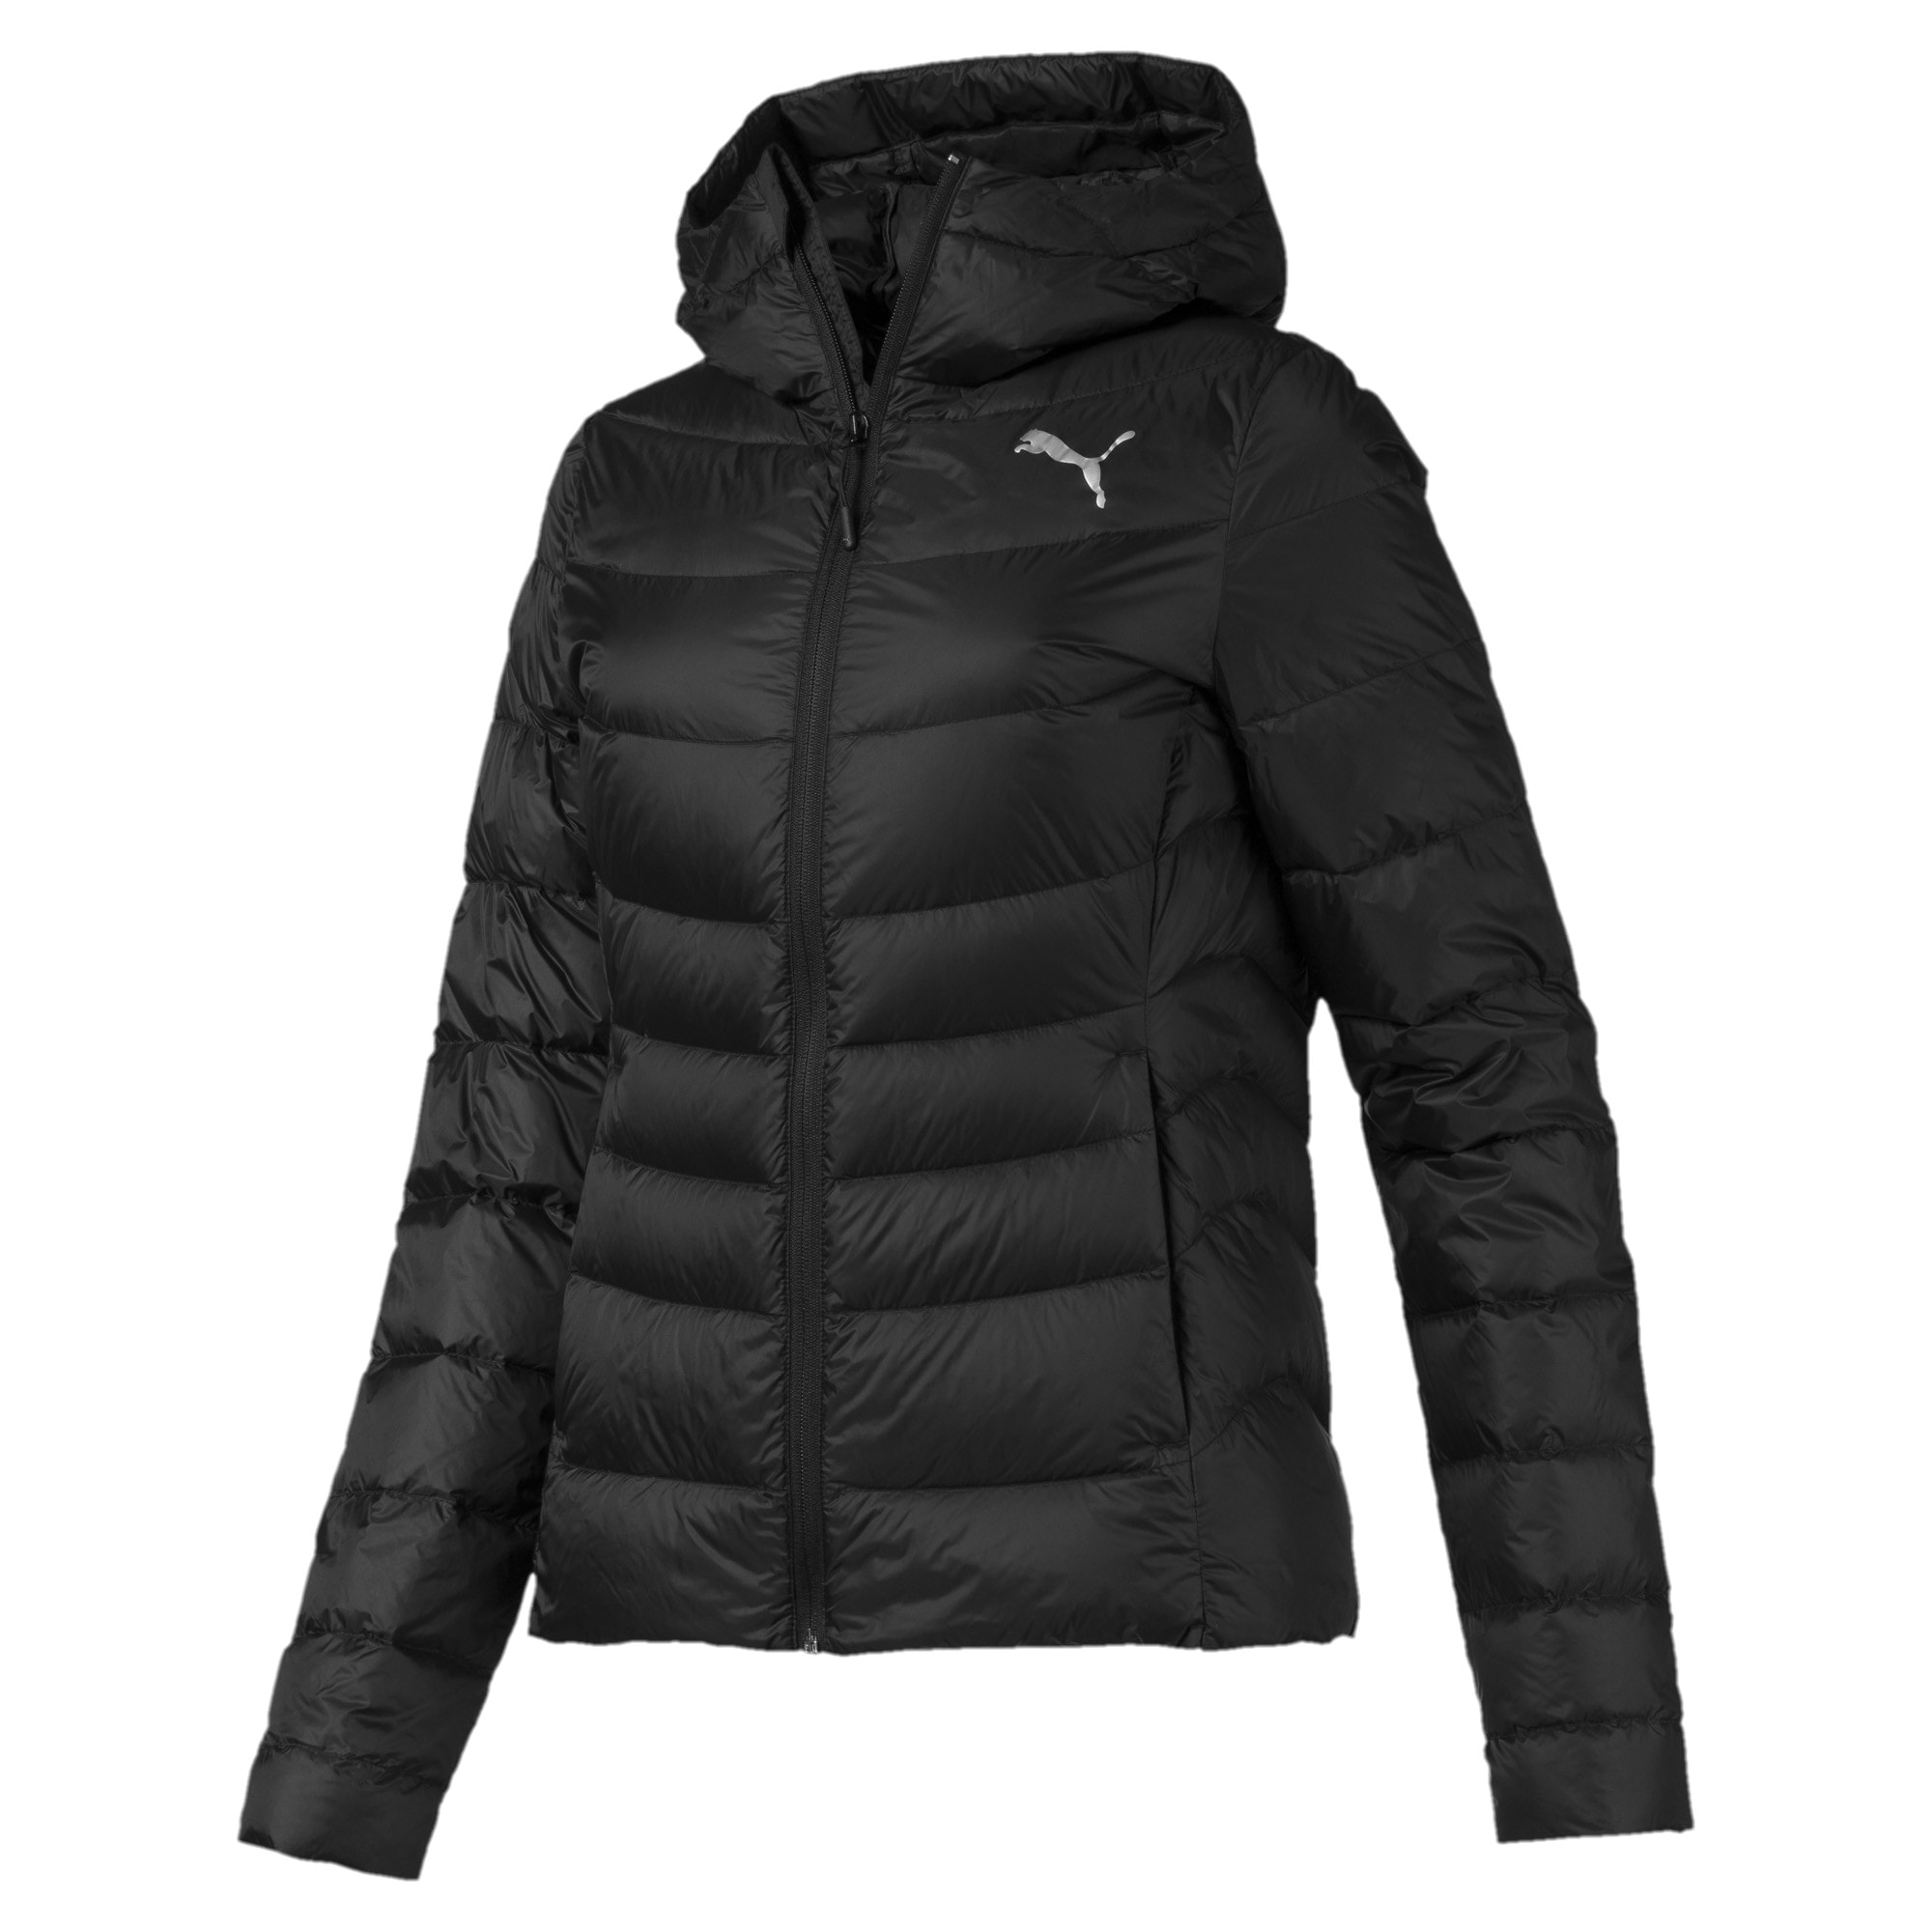 Thumbnail 4 of PWRWarm packLITE Down Women's Jacket, Puma Black, medium